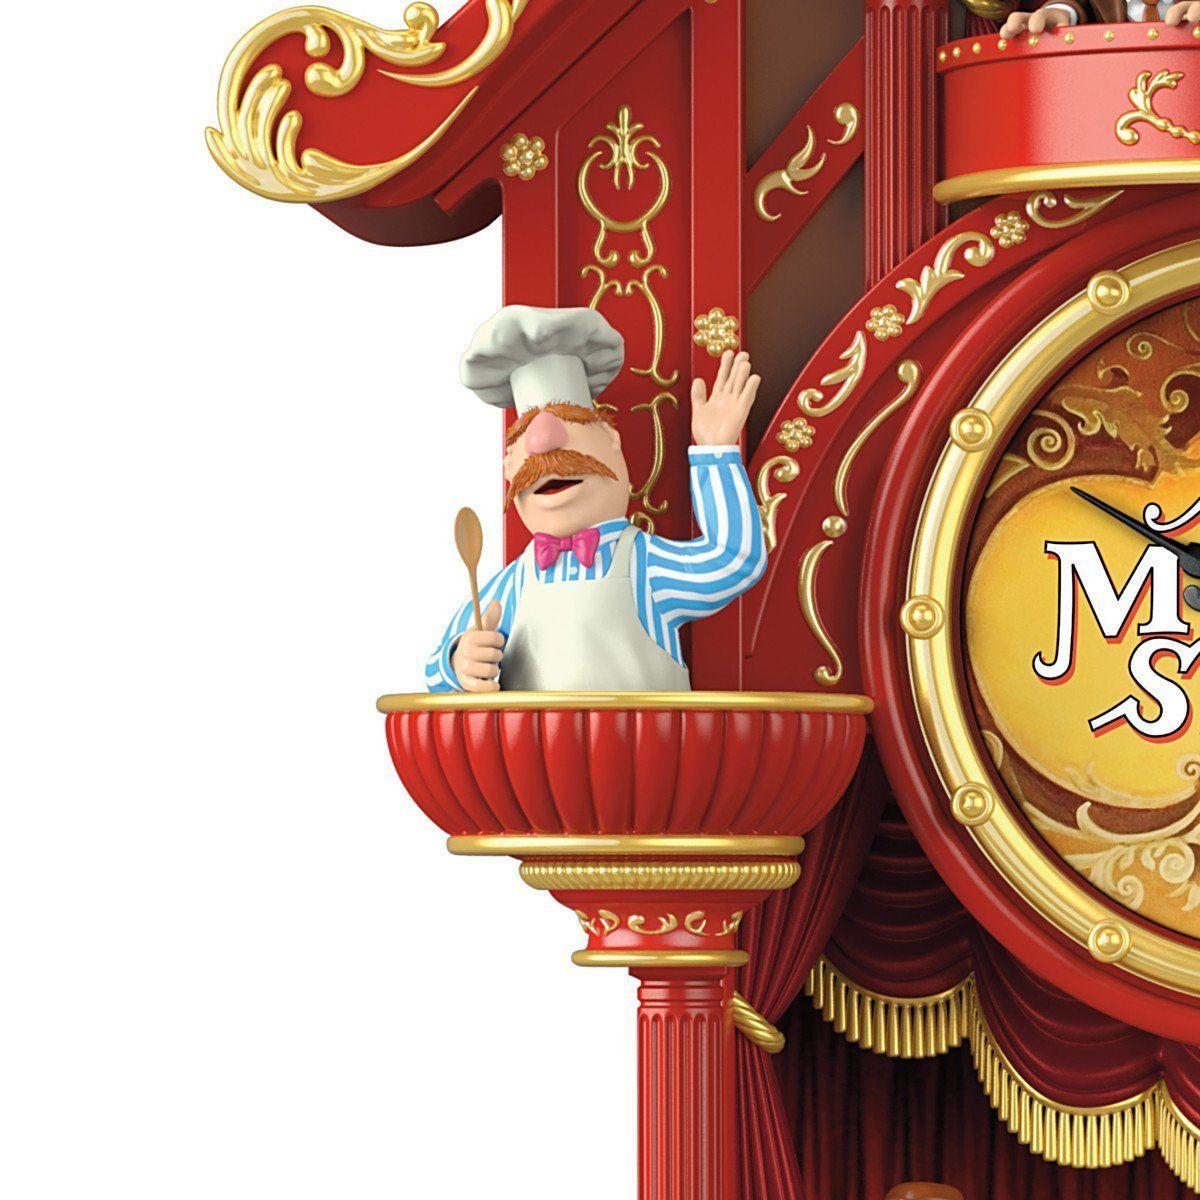 muppets clock | eBay